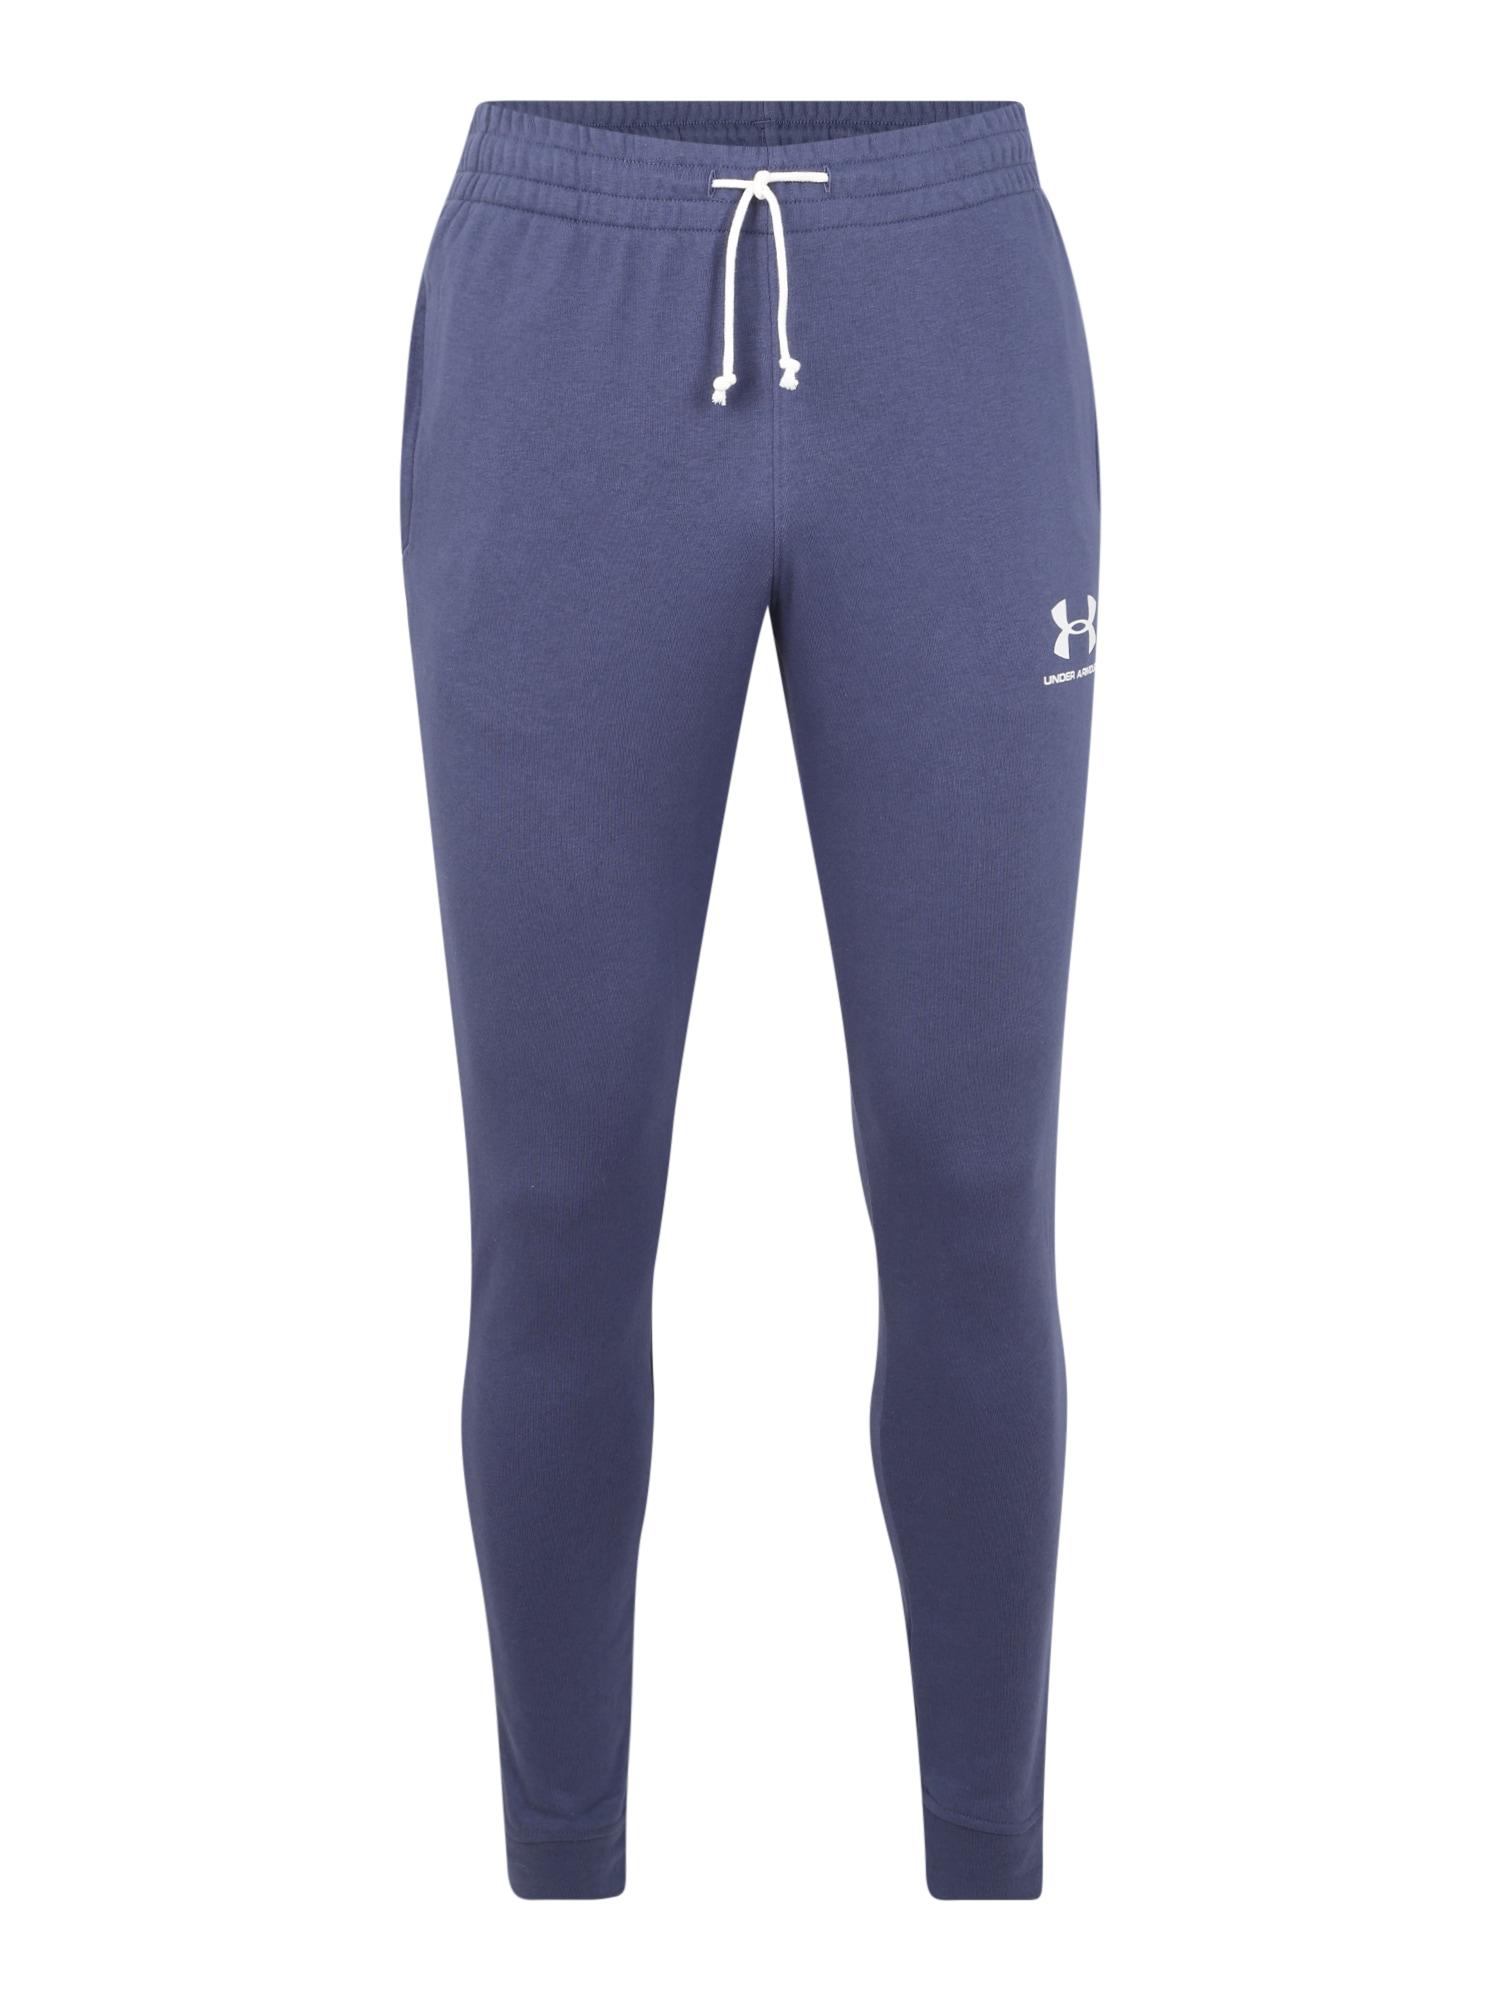 UNDER ARMOUR Sportinės kelnės 'SPORTSTYLE TERRY JOGGER' balta / mėlyna